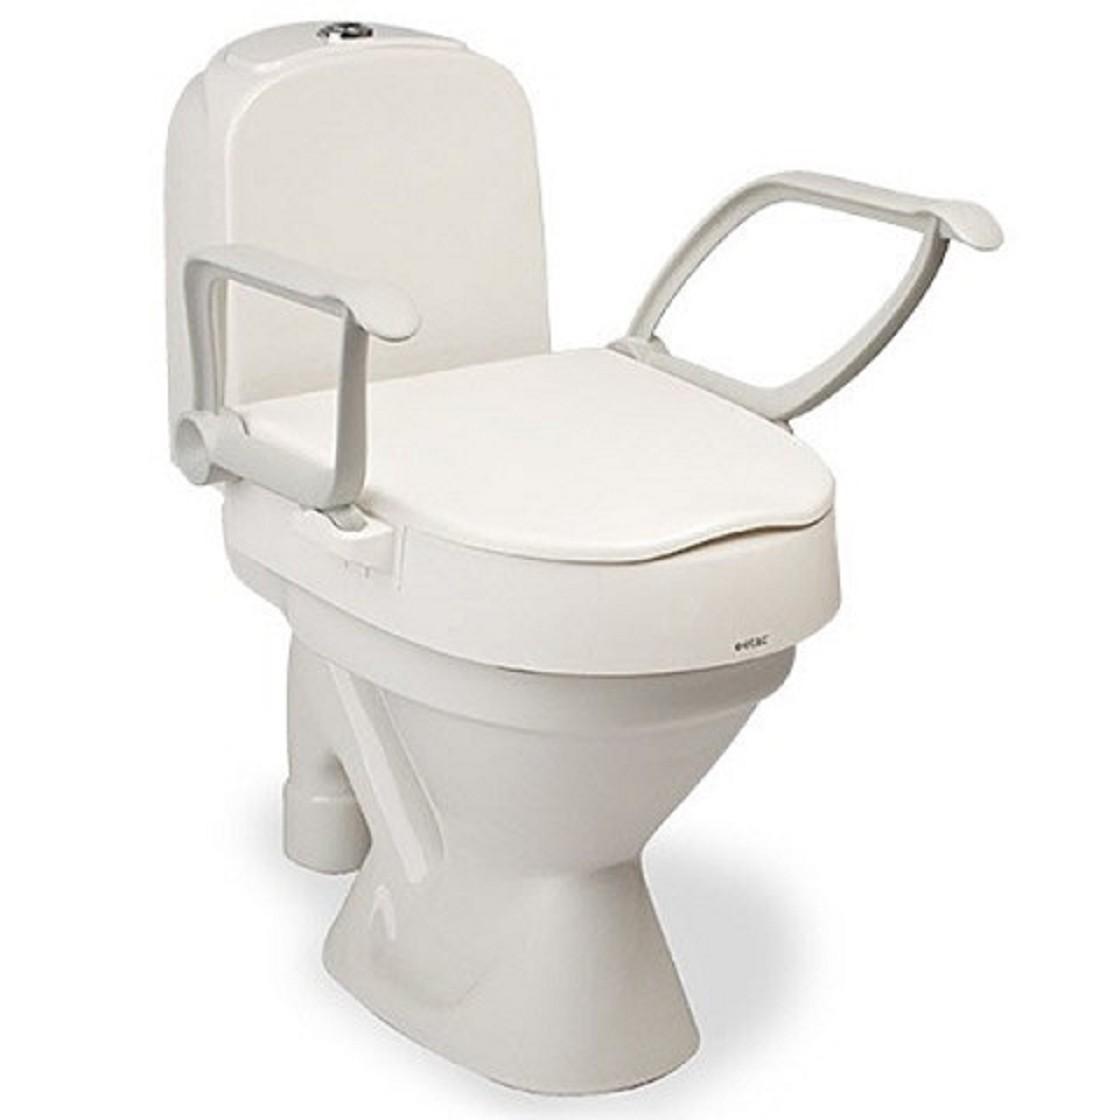 etac cloo raised toilet seat free shipping. Black Bedroom Furniture Sets. Home Design Ideas